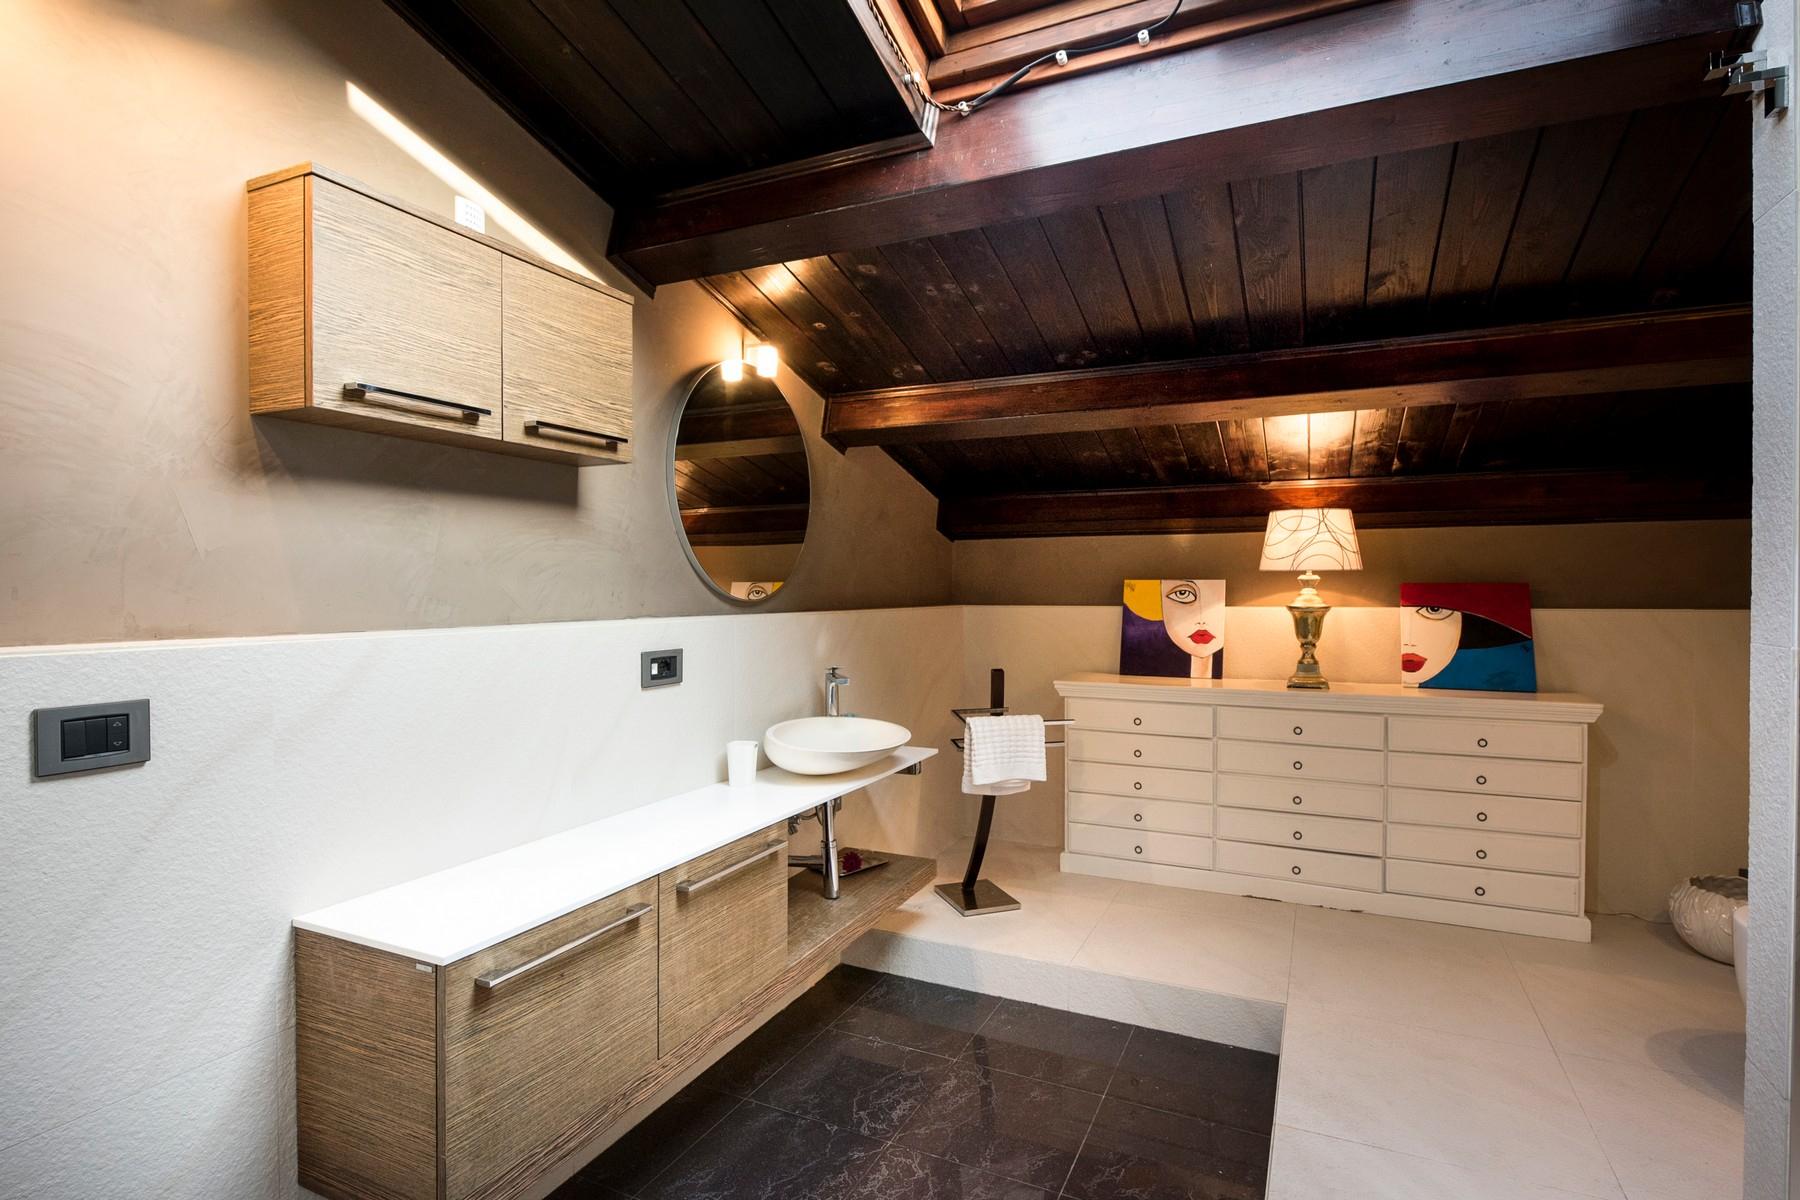 Casa indipendente in Vendita a Noto: 5 locali, 300 mq - Foto 20